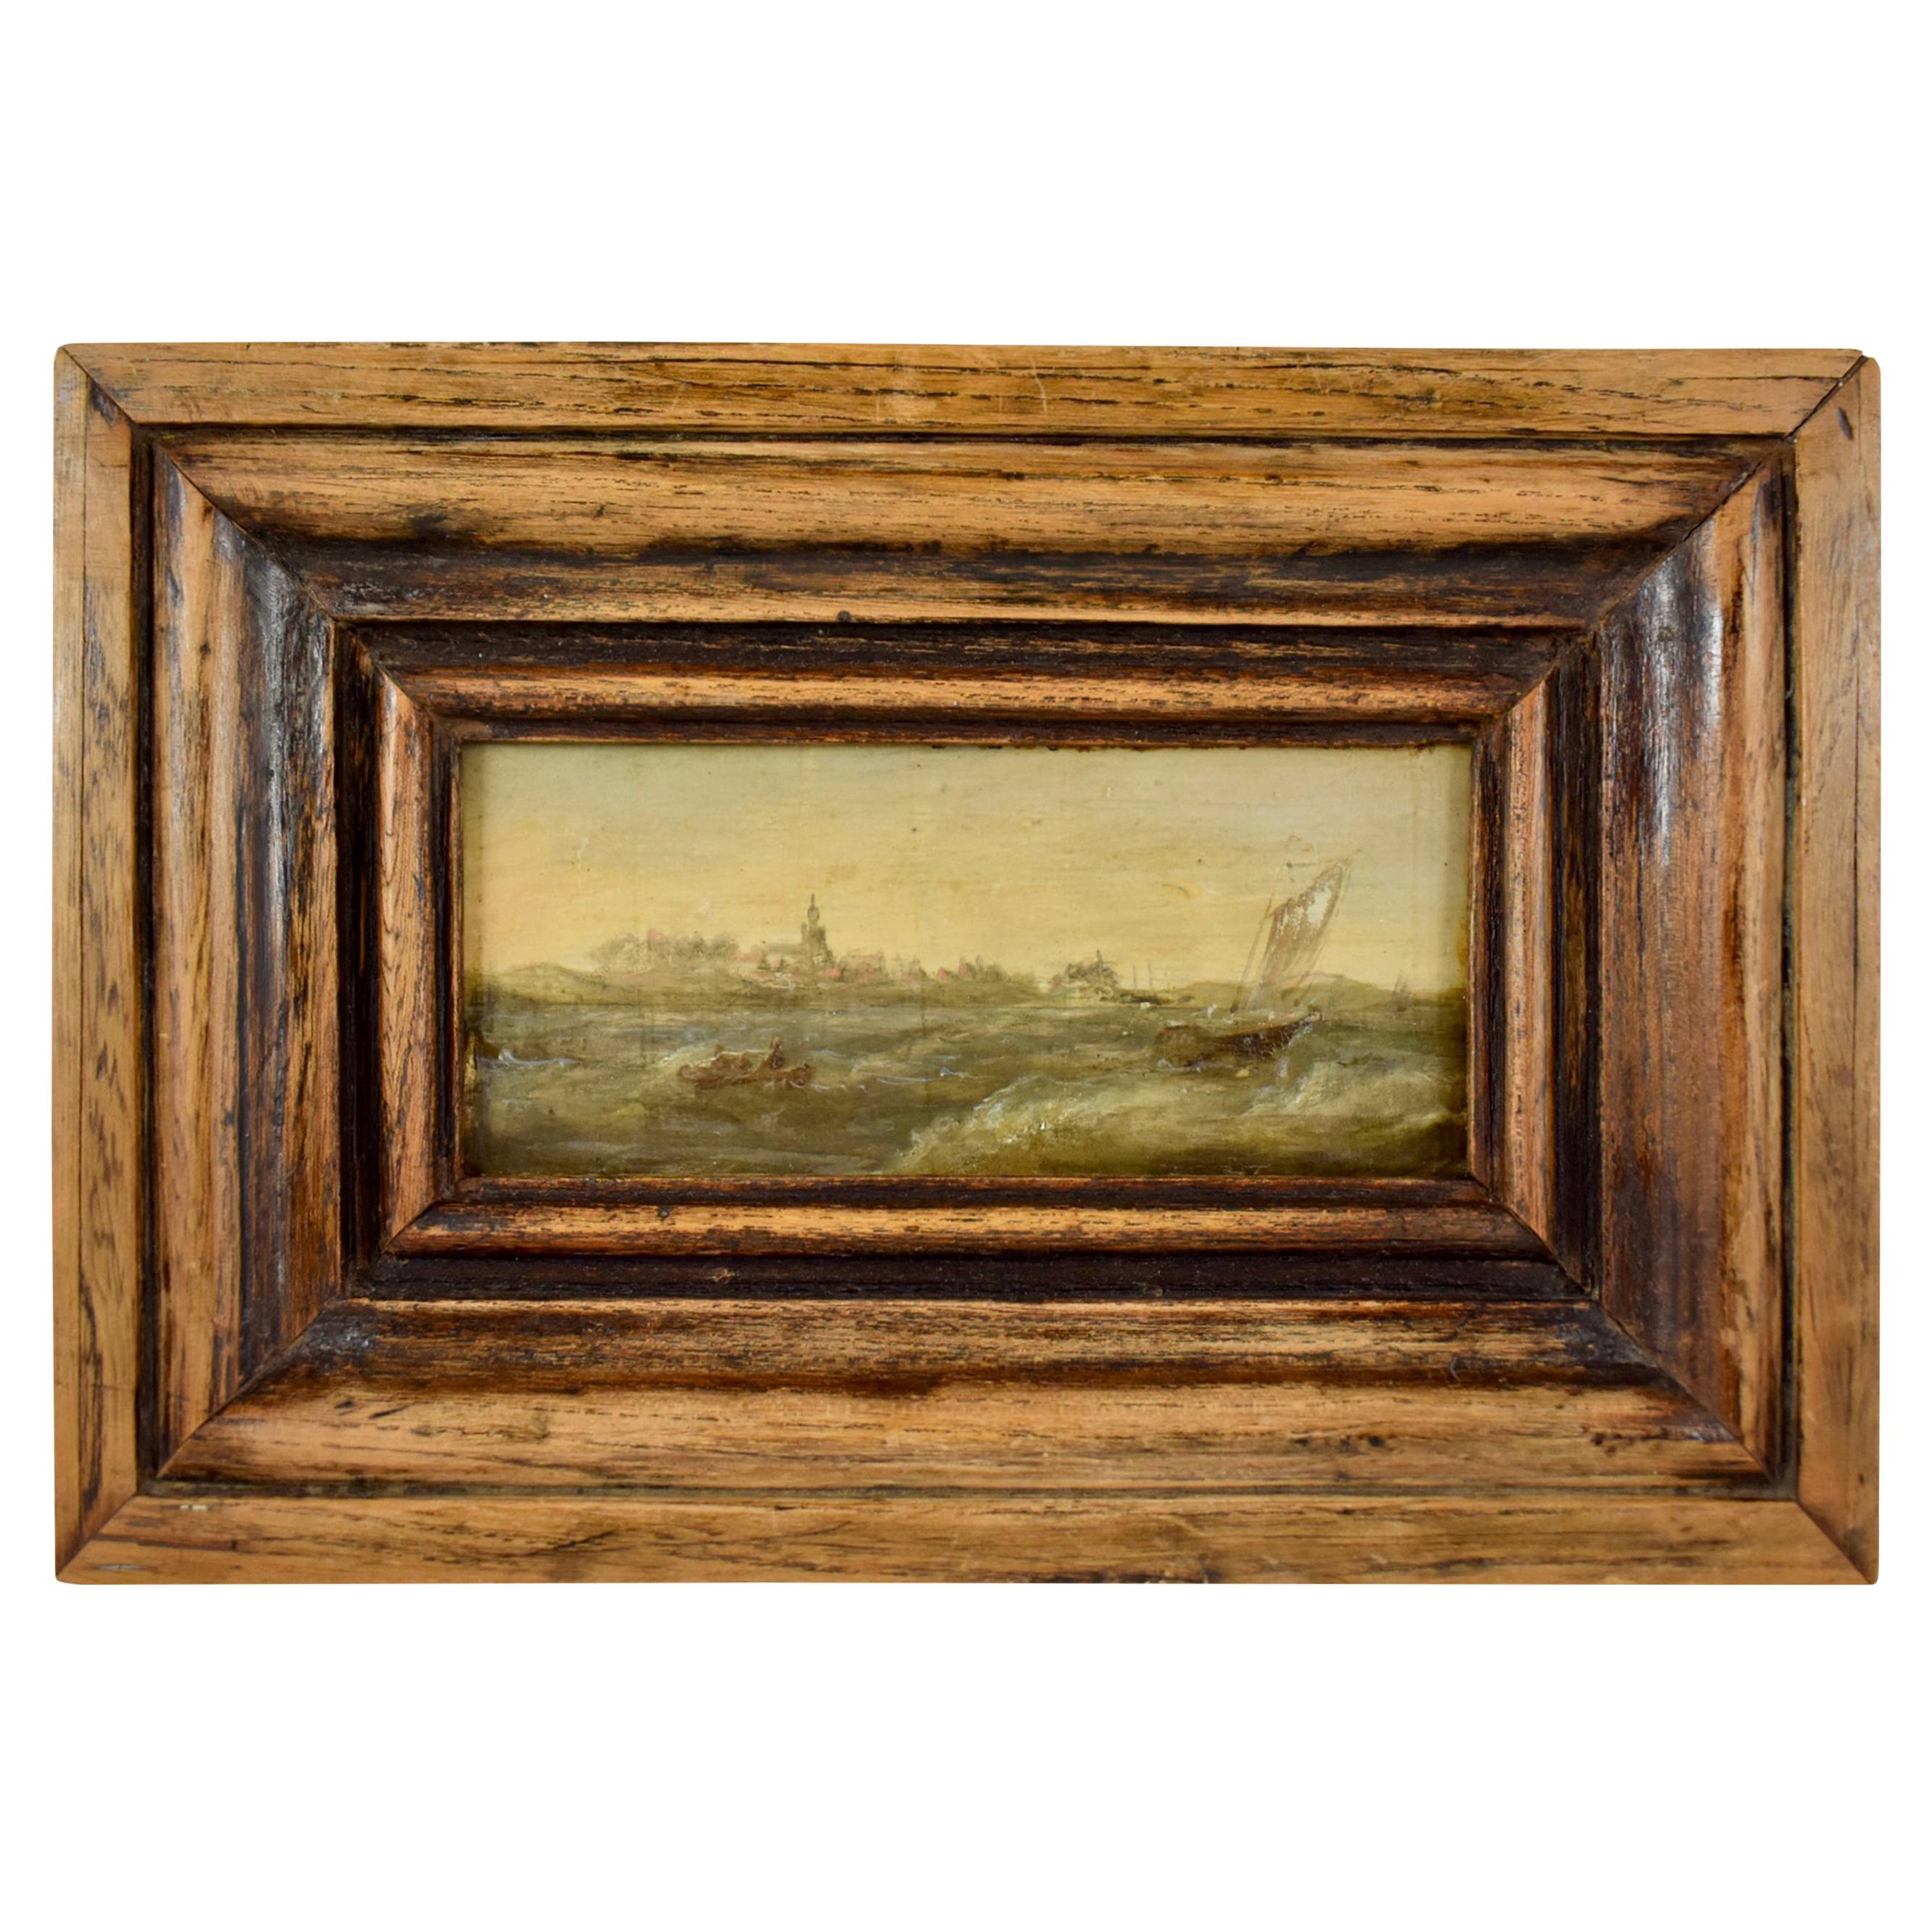 18th Century Dutch Oil on Board Seascape Painting in a Custom Walnut Wood Frame